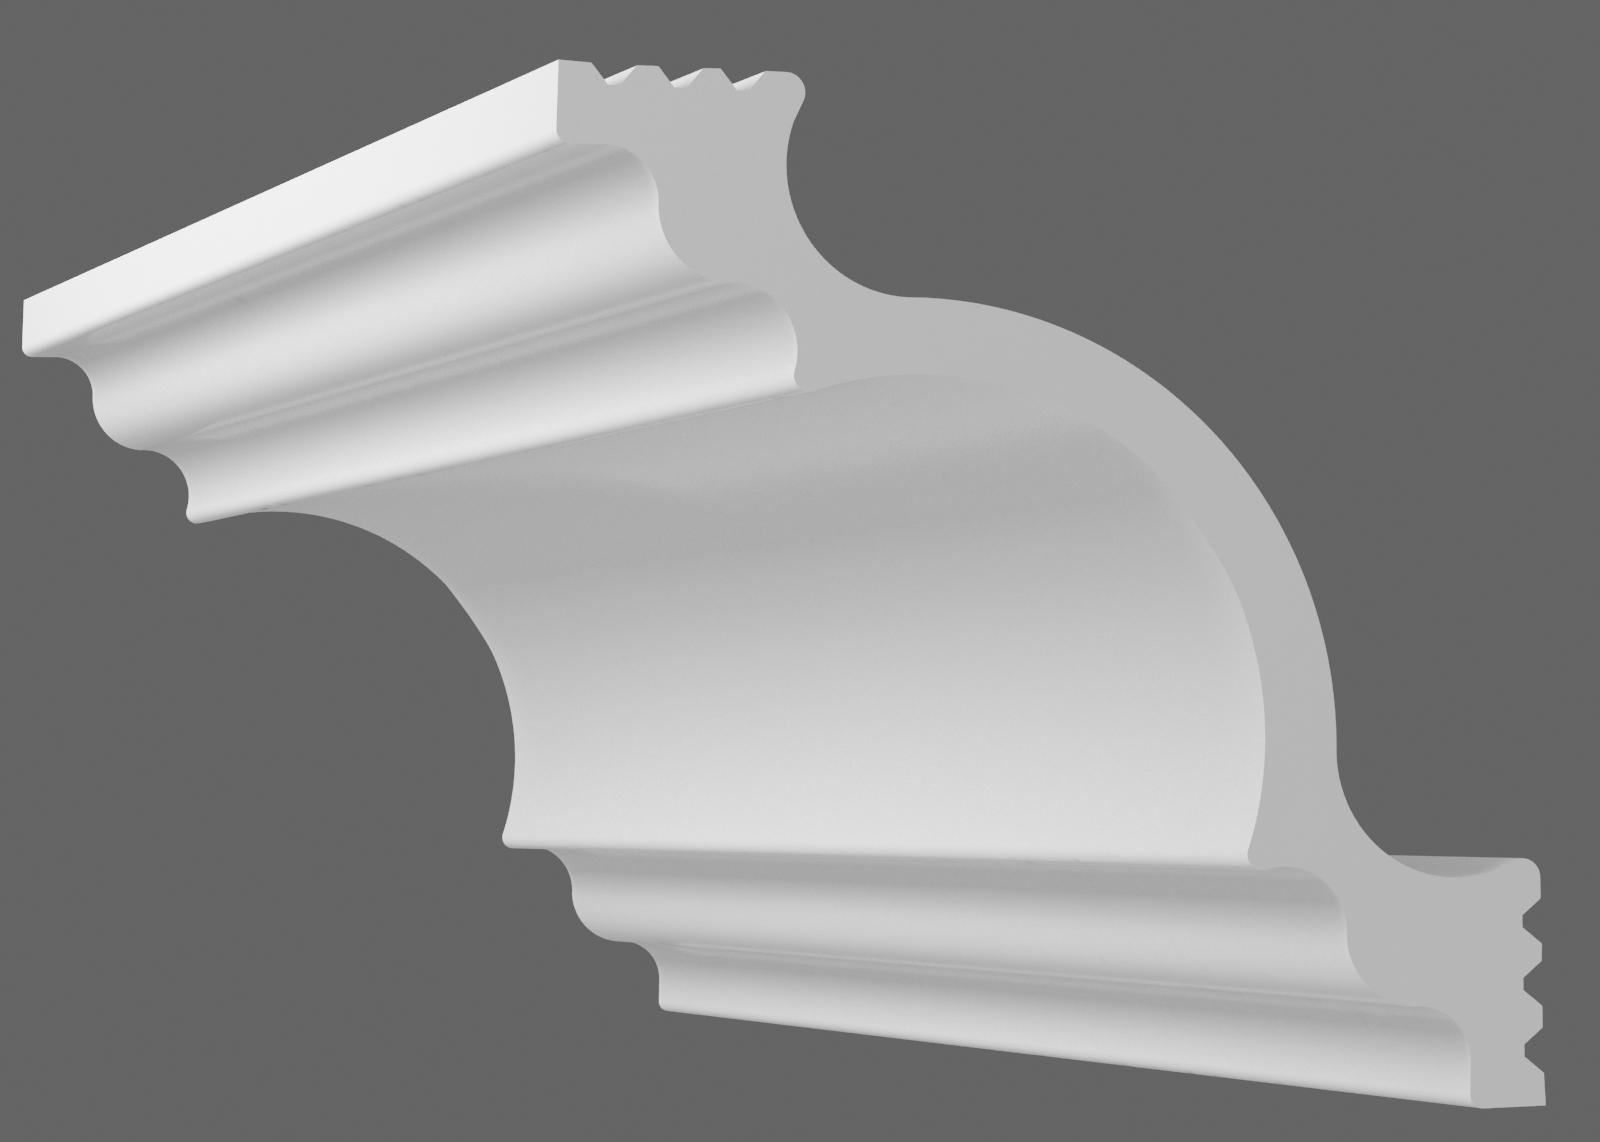 Потолочный плинтус К-80 (Размер:65х65мм)